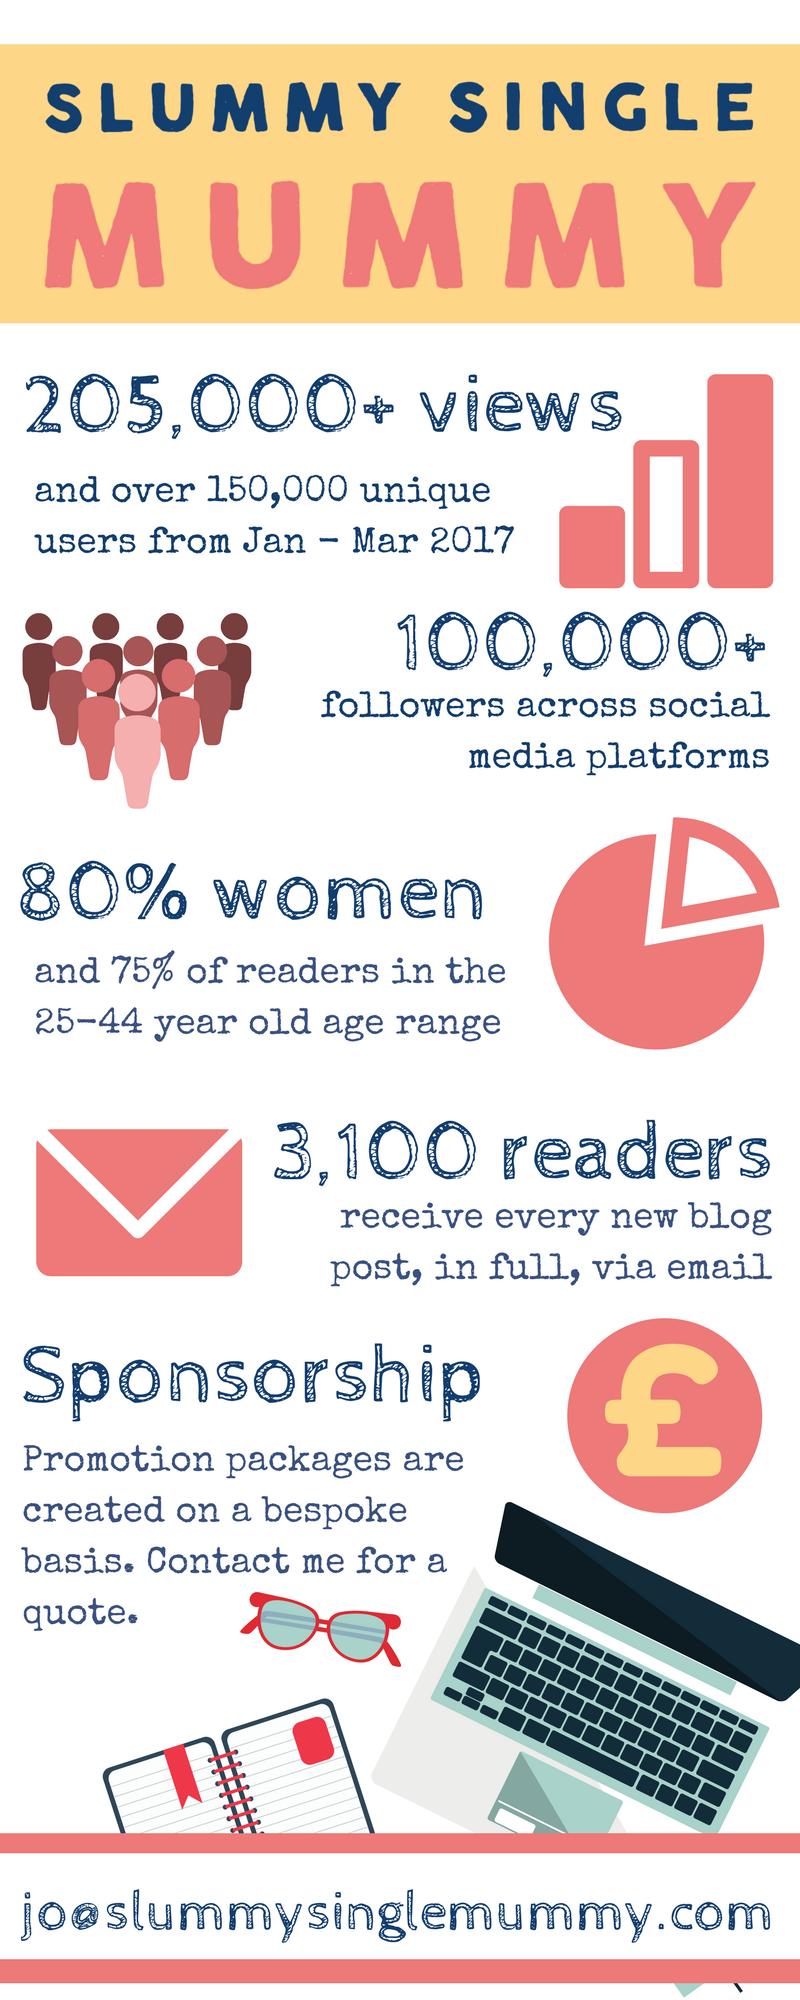 Slummy single mummy blog stats media pack